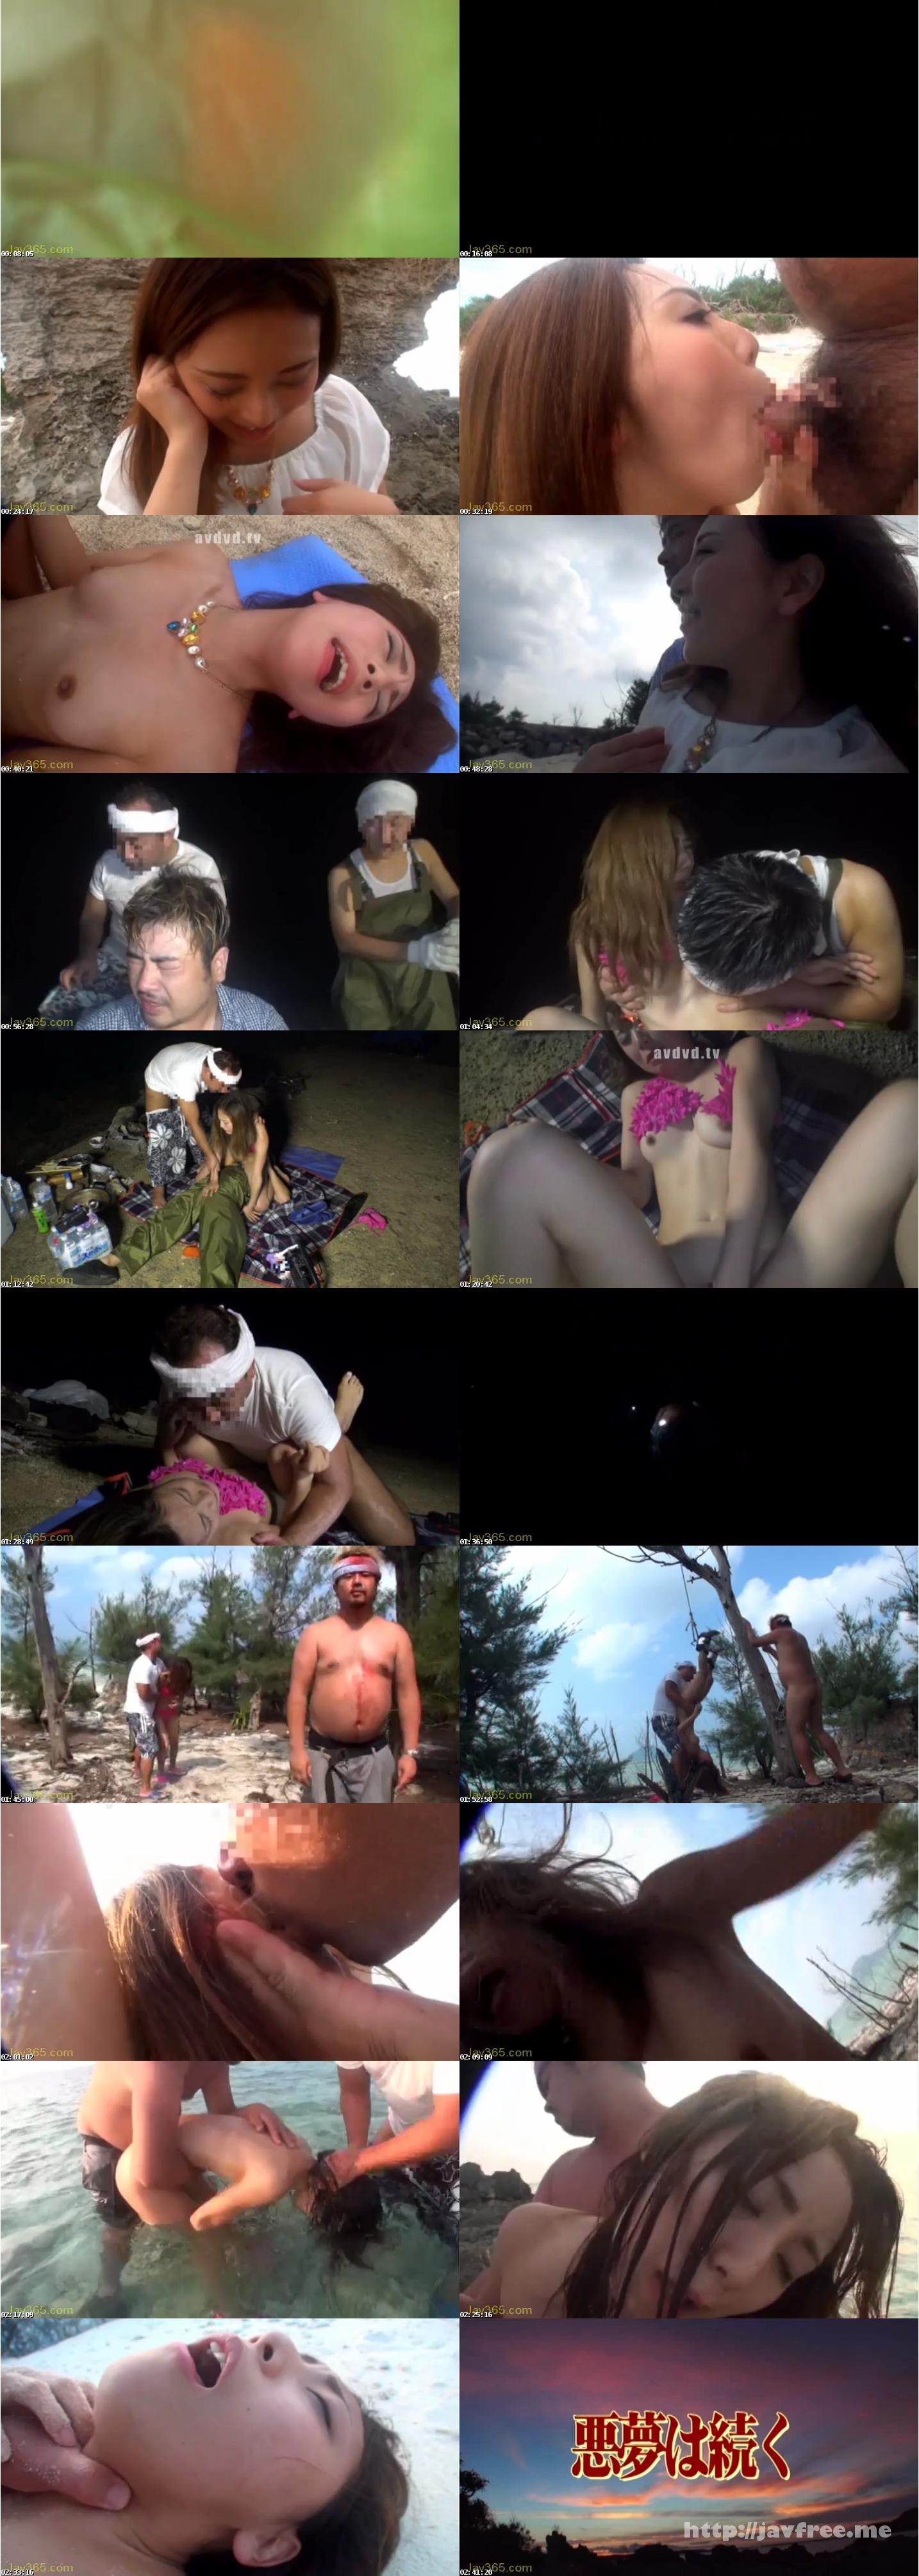 [SVDVD 438] 新・無人島レイプサバイバル 地獄の48時間 逃げる場所も迎えも来ない島に残された女は何度でも犯される!No man's Island!! 仁美まどか 仁美まどか SVDVD